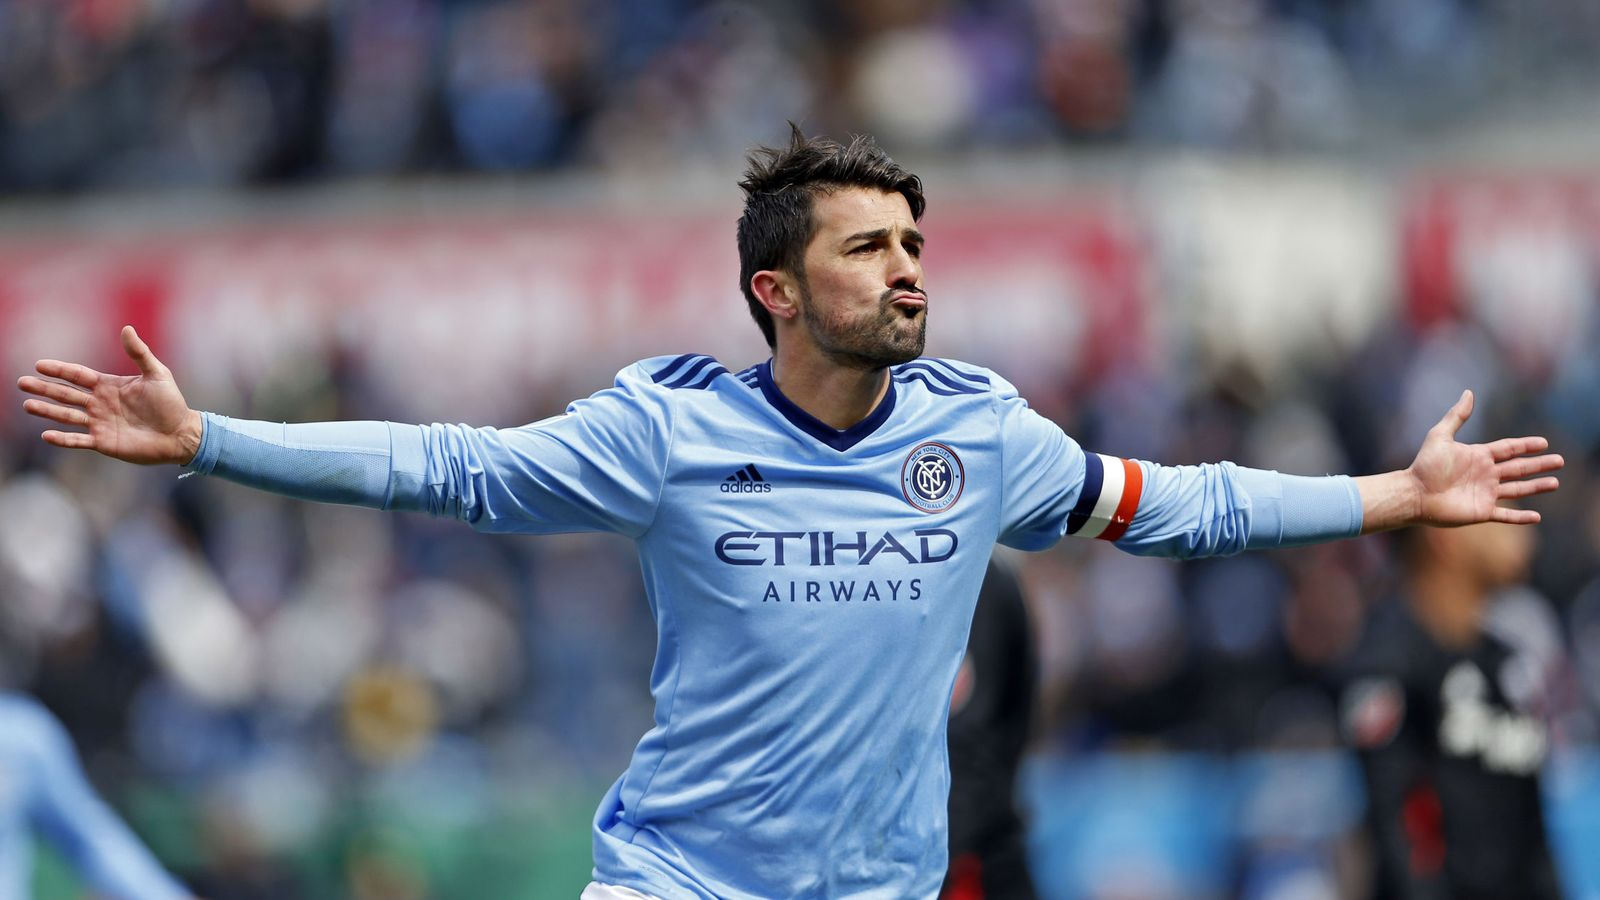 Foto: David Villa brilla sin parar en el New York City de la MLS. (Reuters)